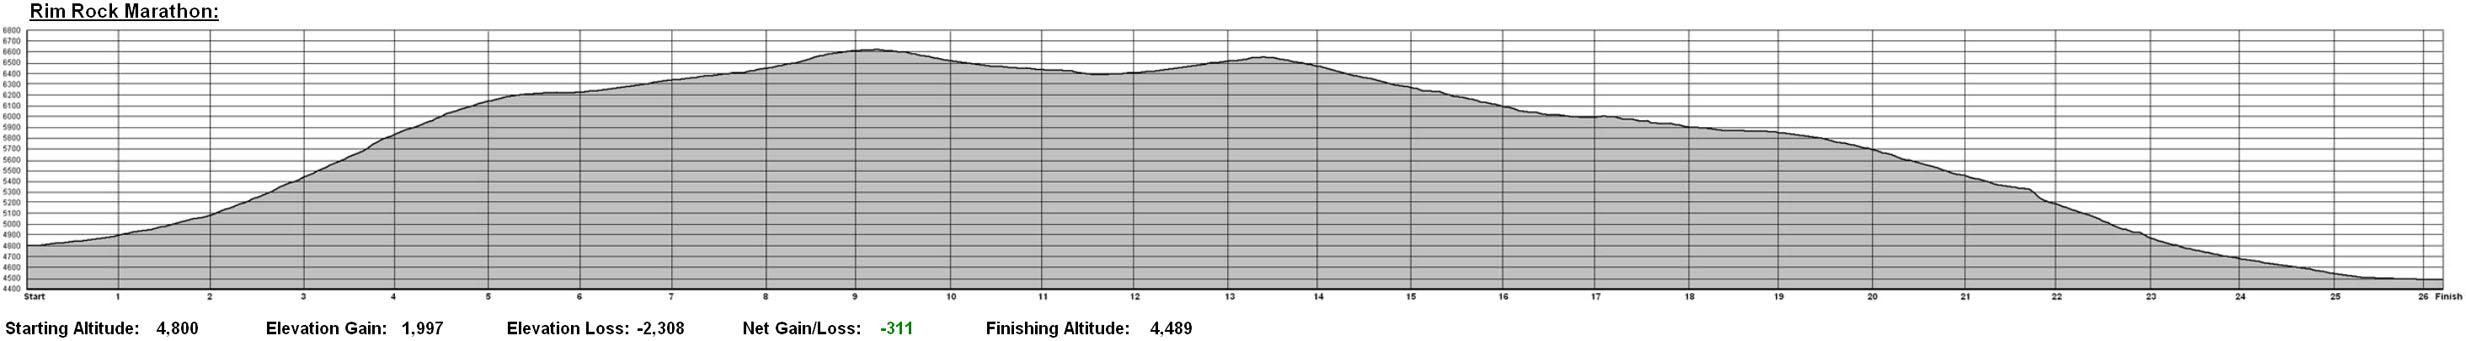 Rim Rock Marathon Elevation Chart